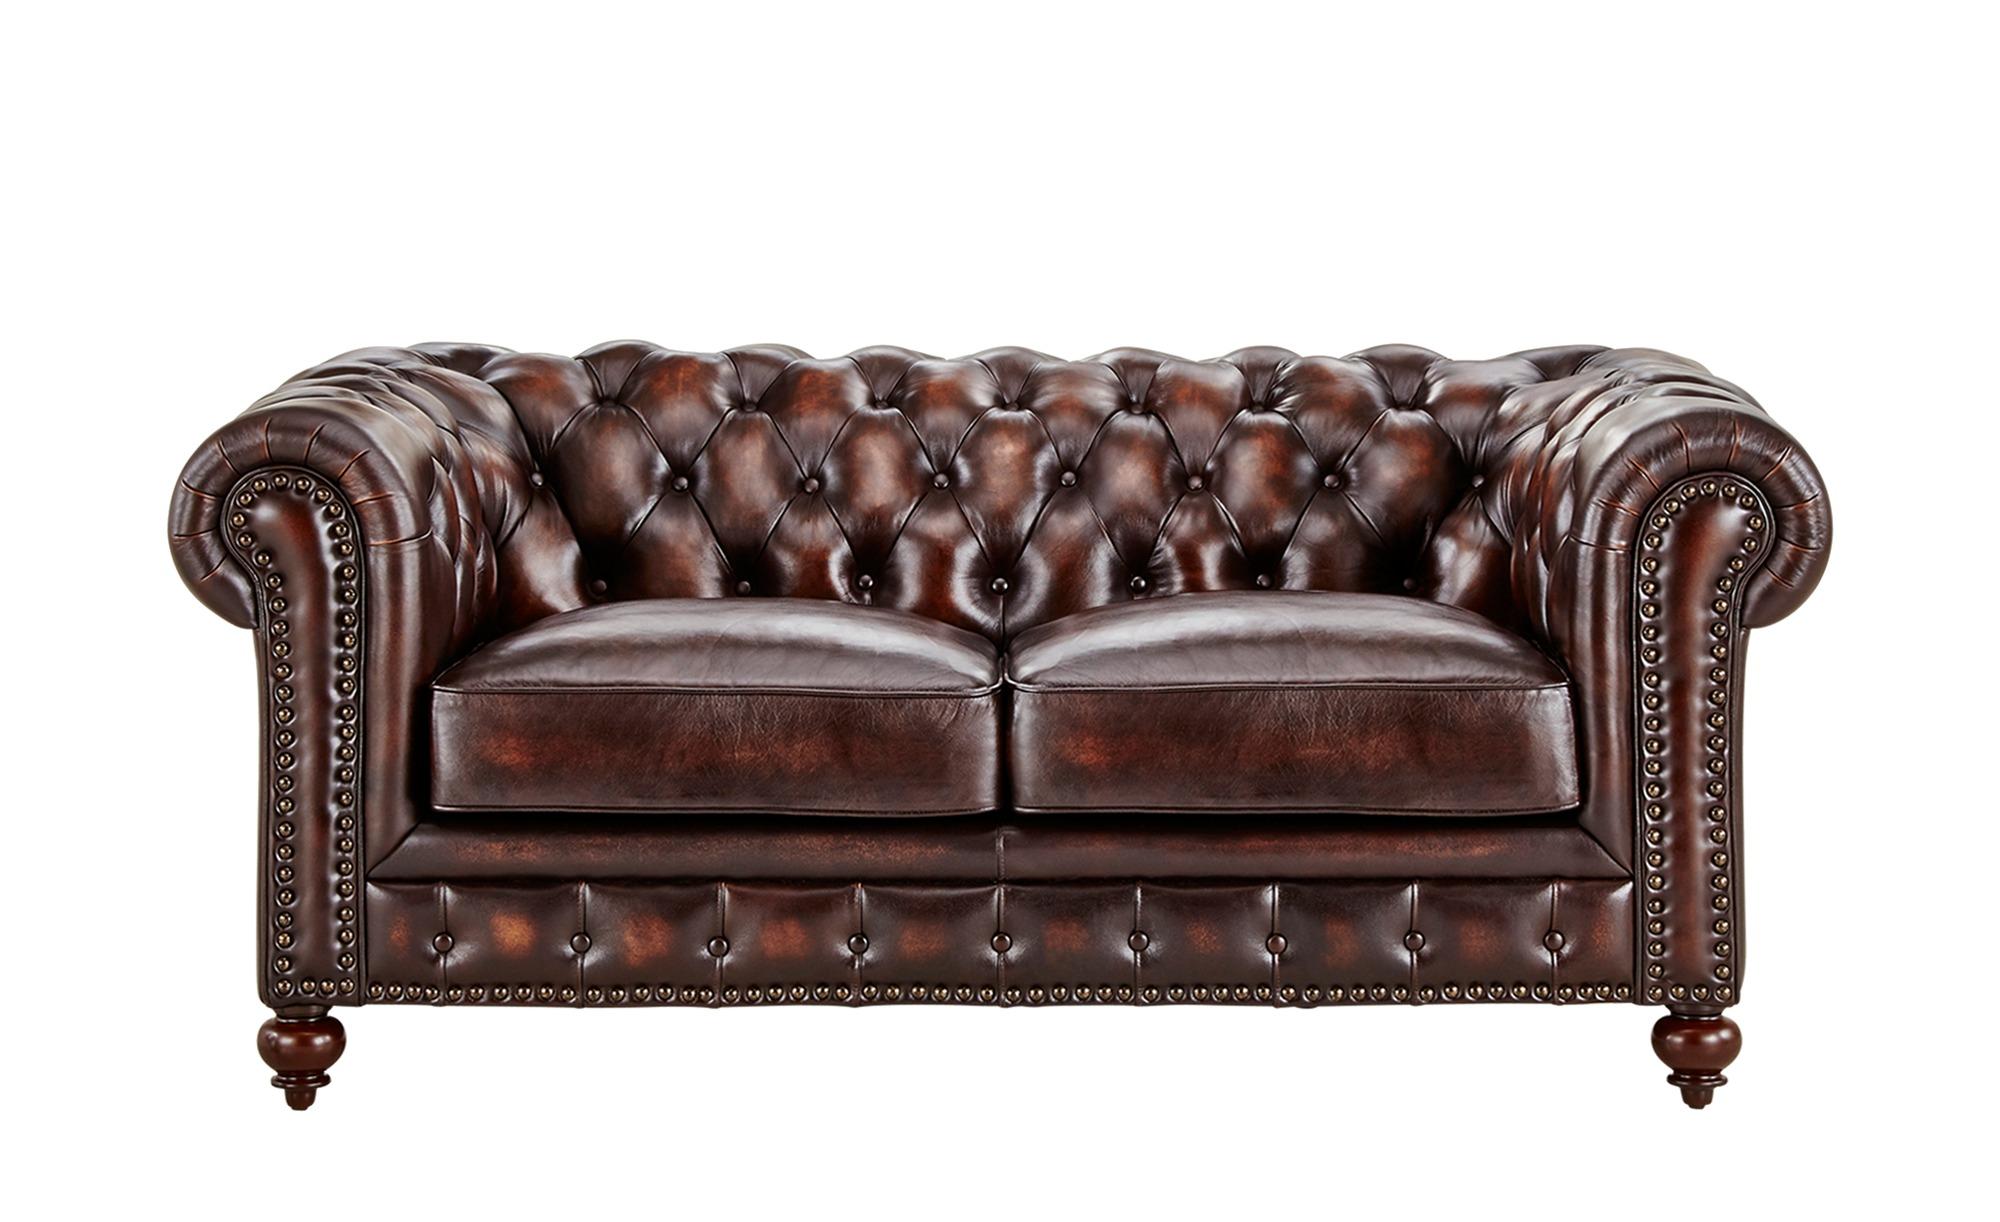 Full Size of Sofa Leder Braun Ikea Couch Vintage 3 Sitzer   Chesterfield Kaufen 3 2 1 Set Gebraucht Ledersofa Design Rustikal Uno Sitzig Hffner Mit Bettfunktion Big Xxl Sofa Sofa Leder Braun